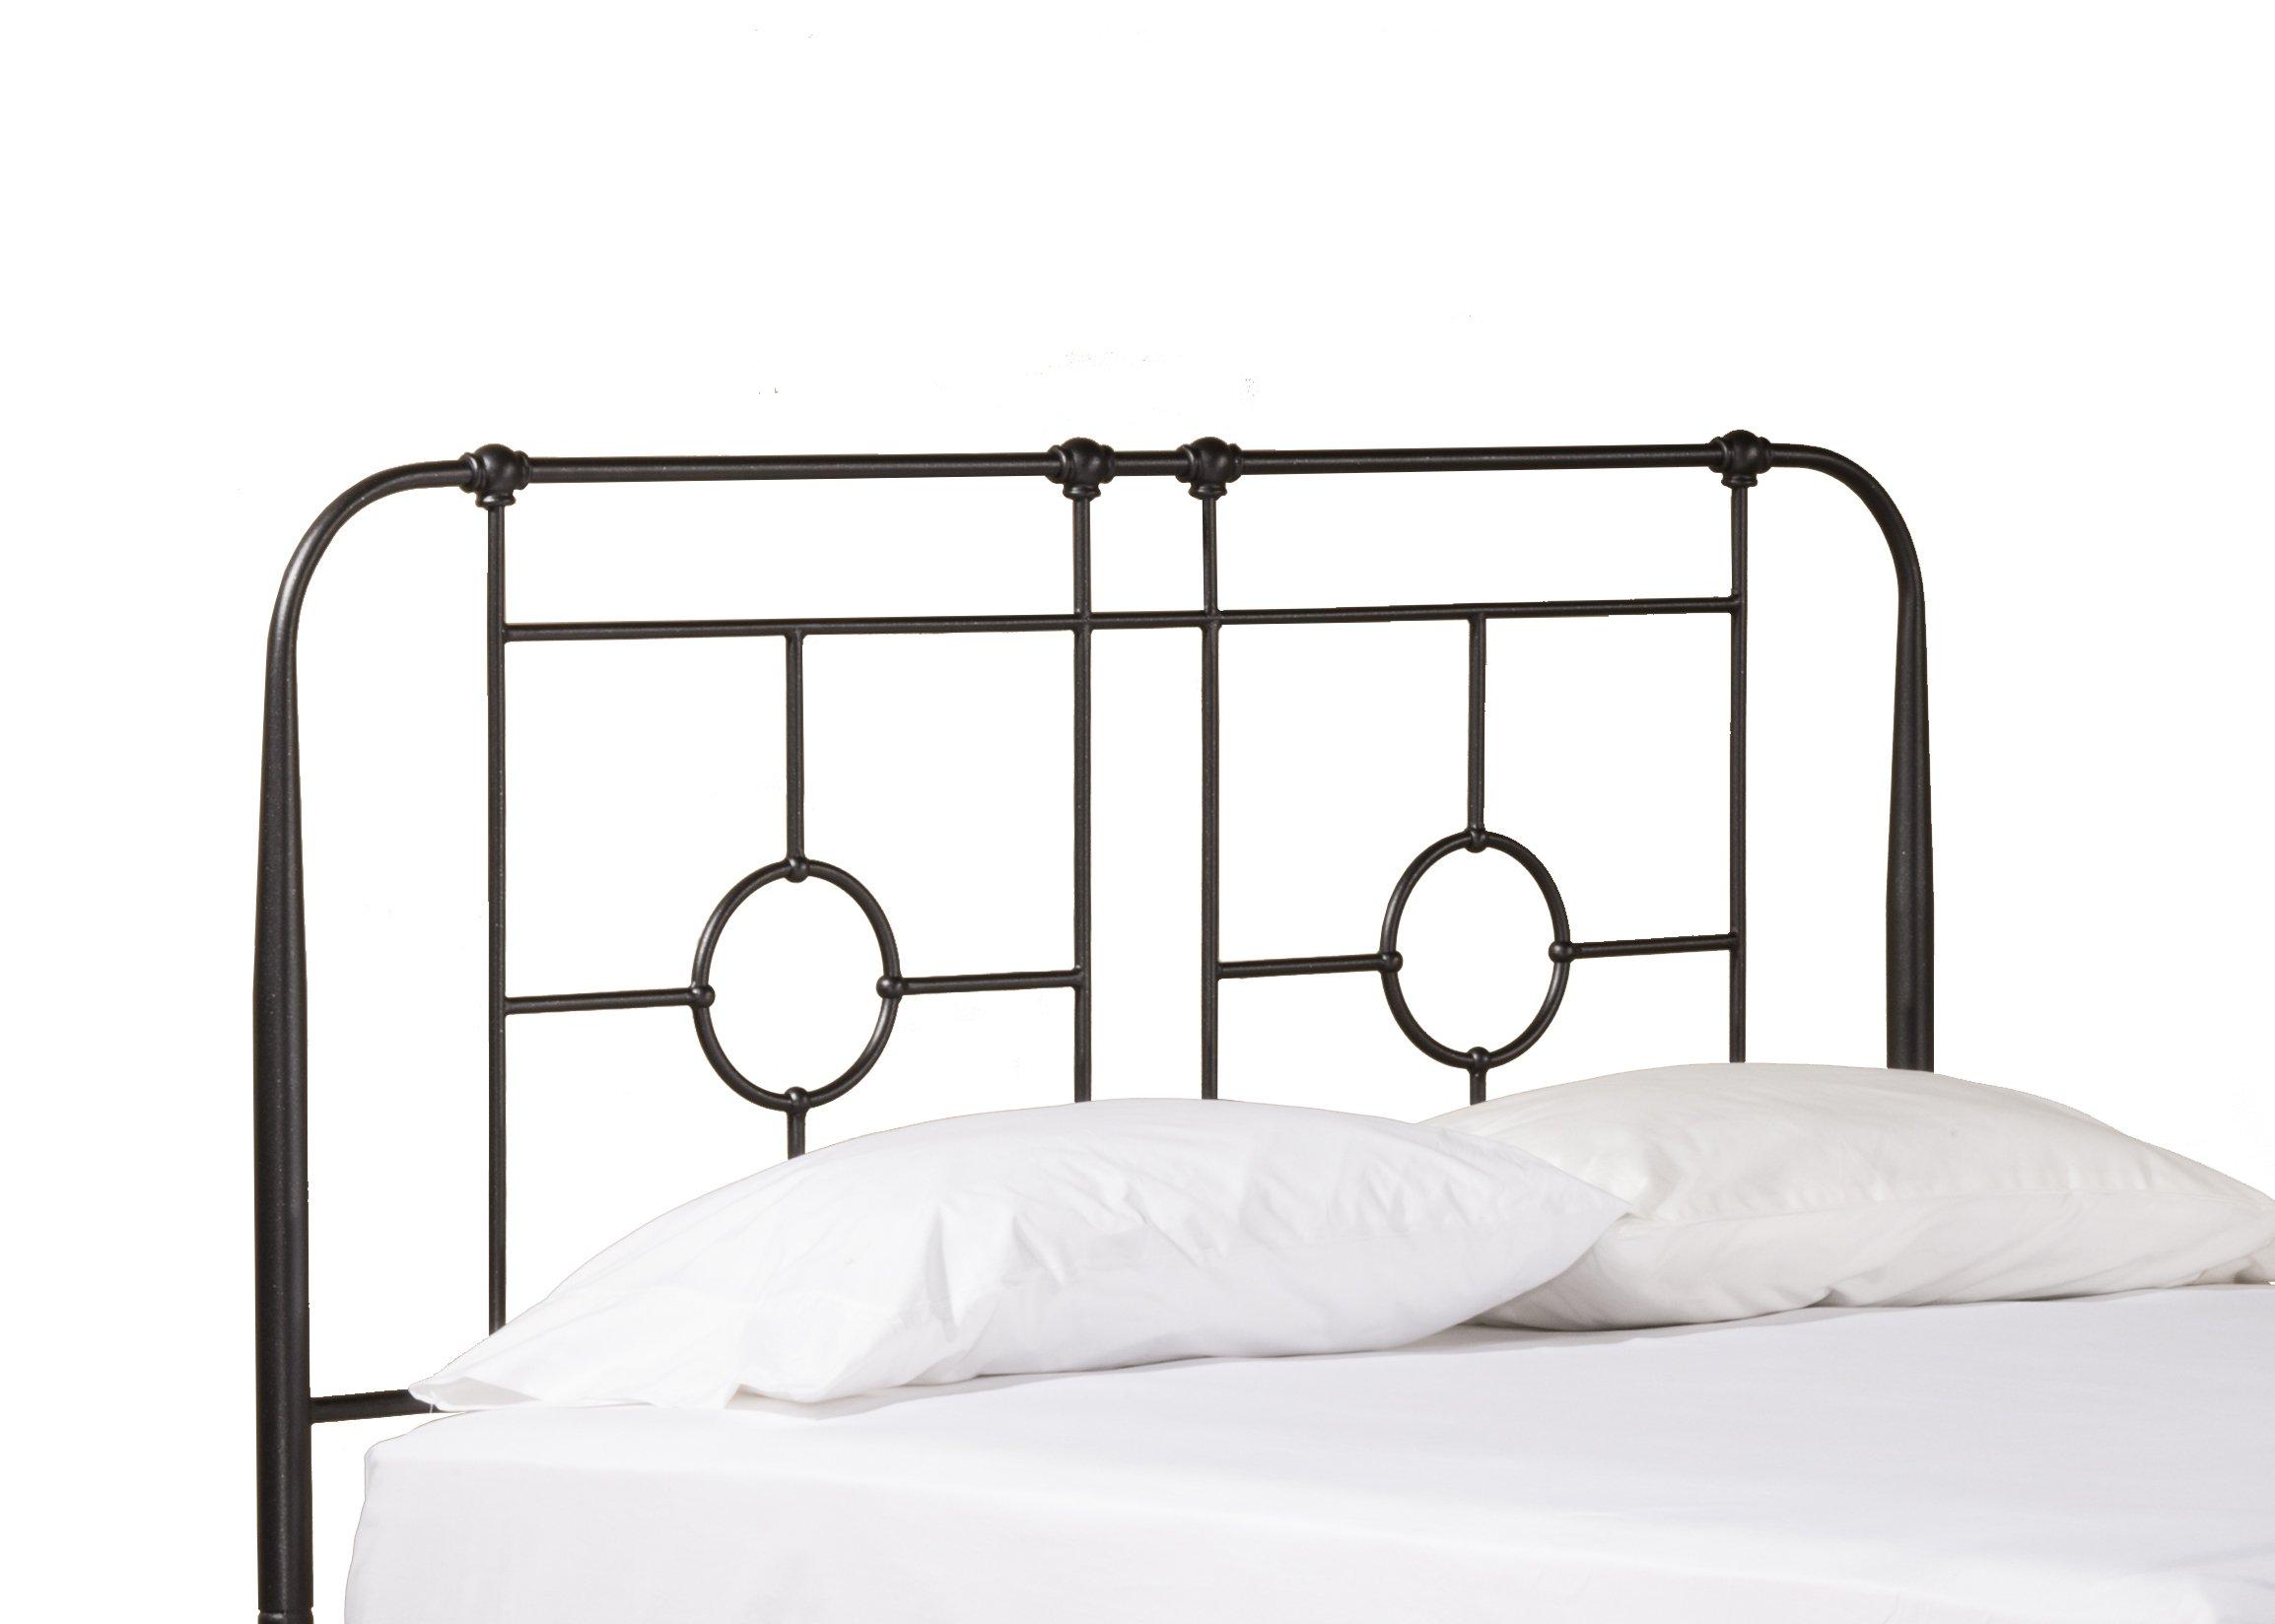 Hillsdale Furniture Hillsdale Trenton King Bed Headboard without Frame, Black Sparkle